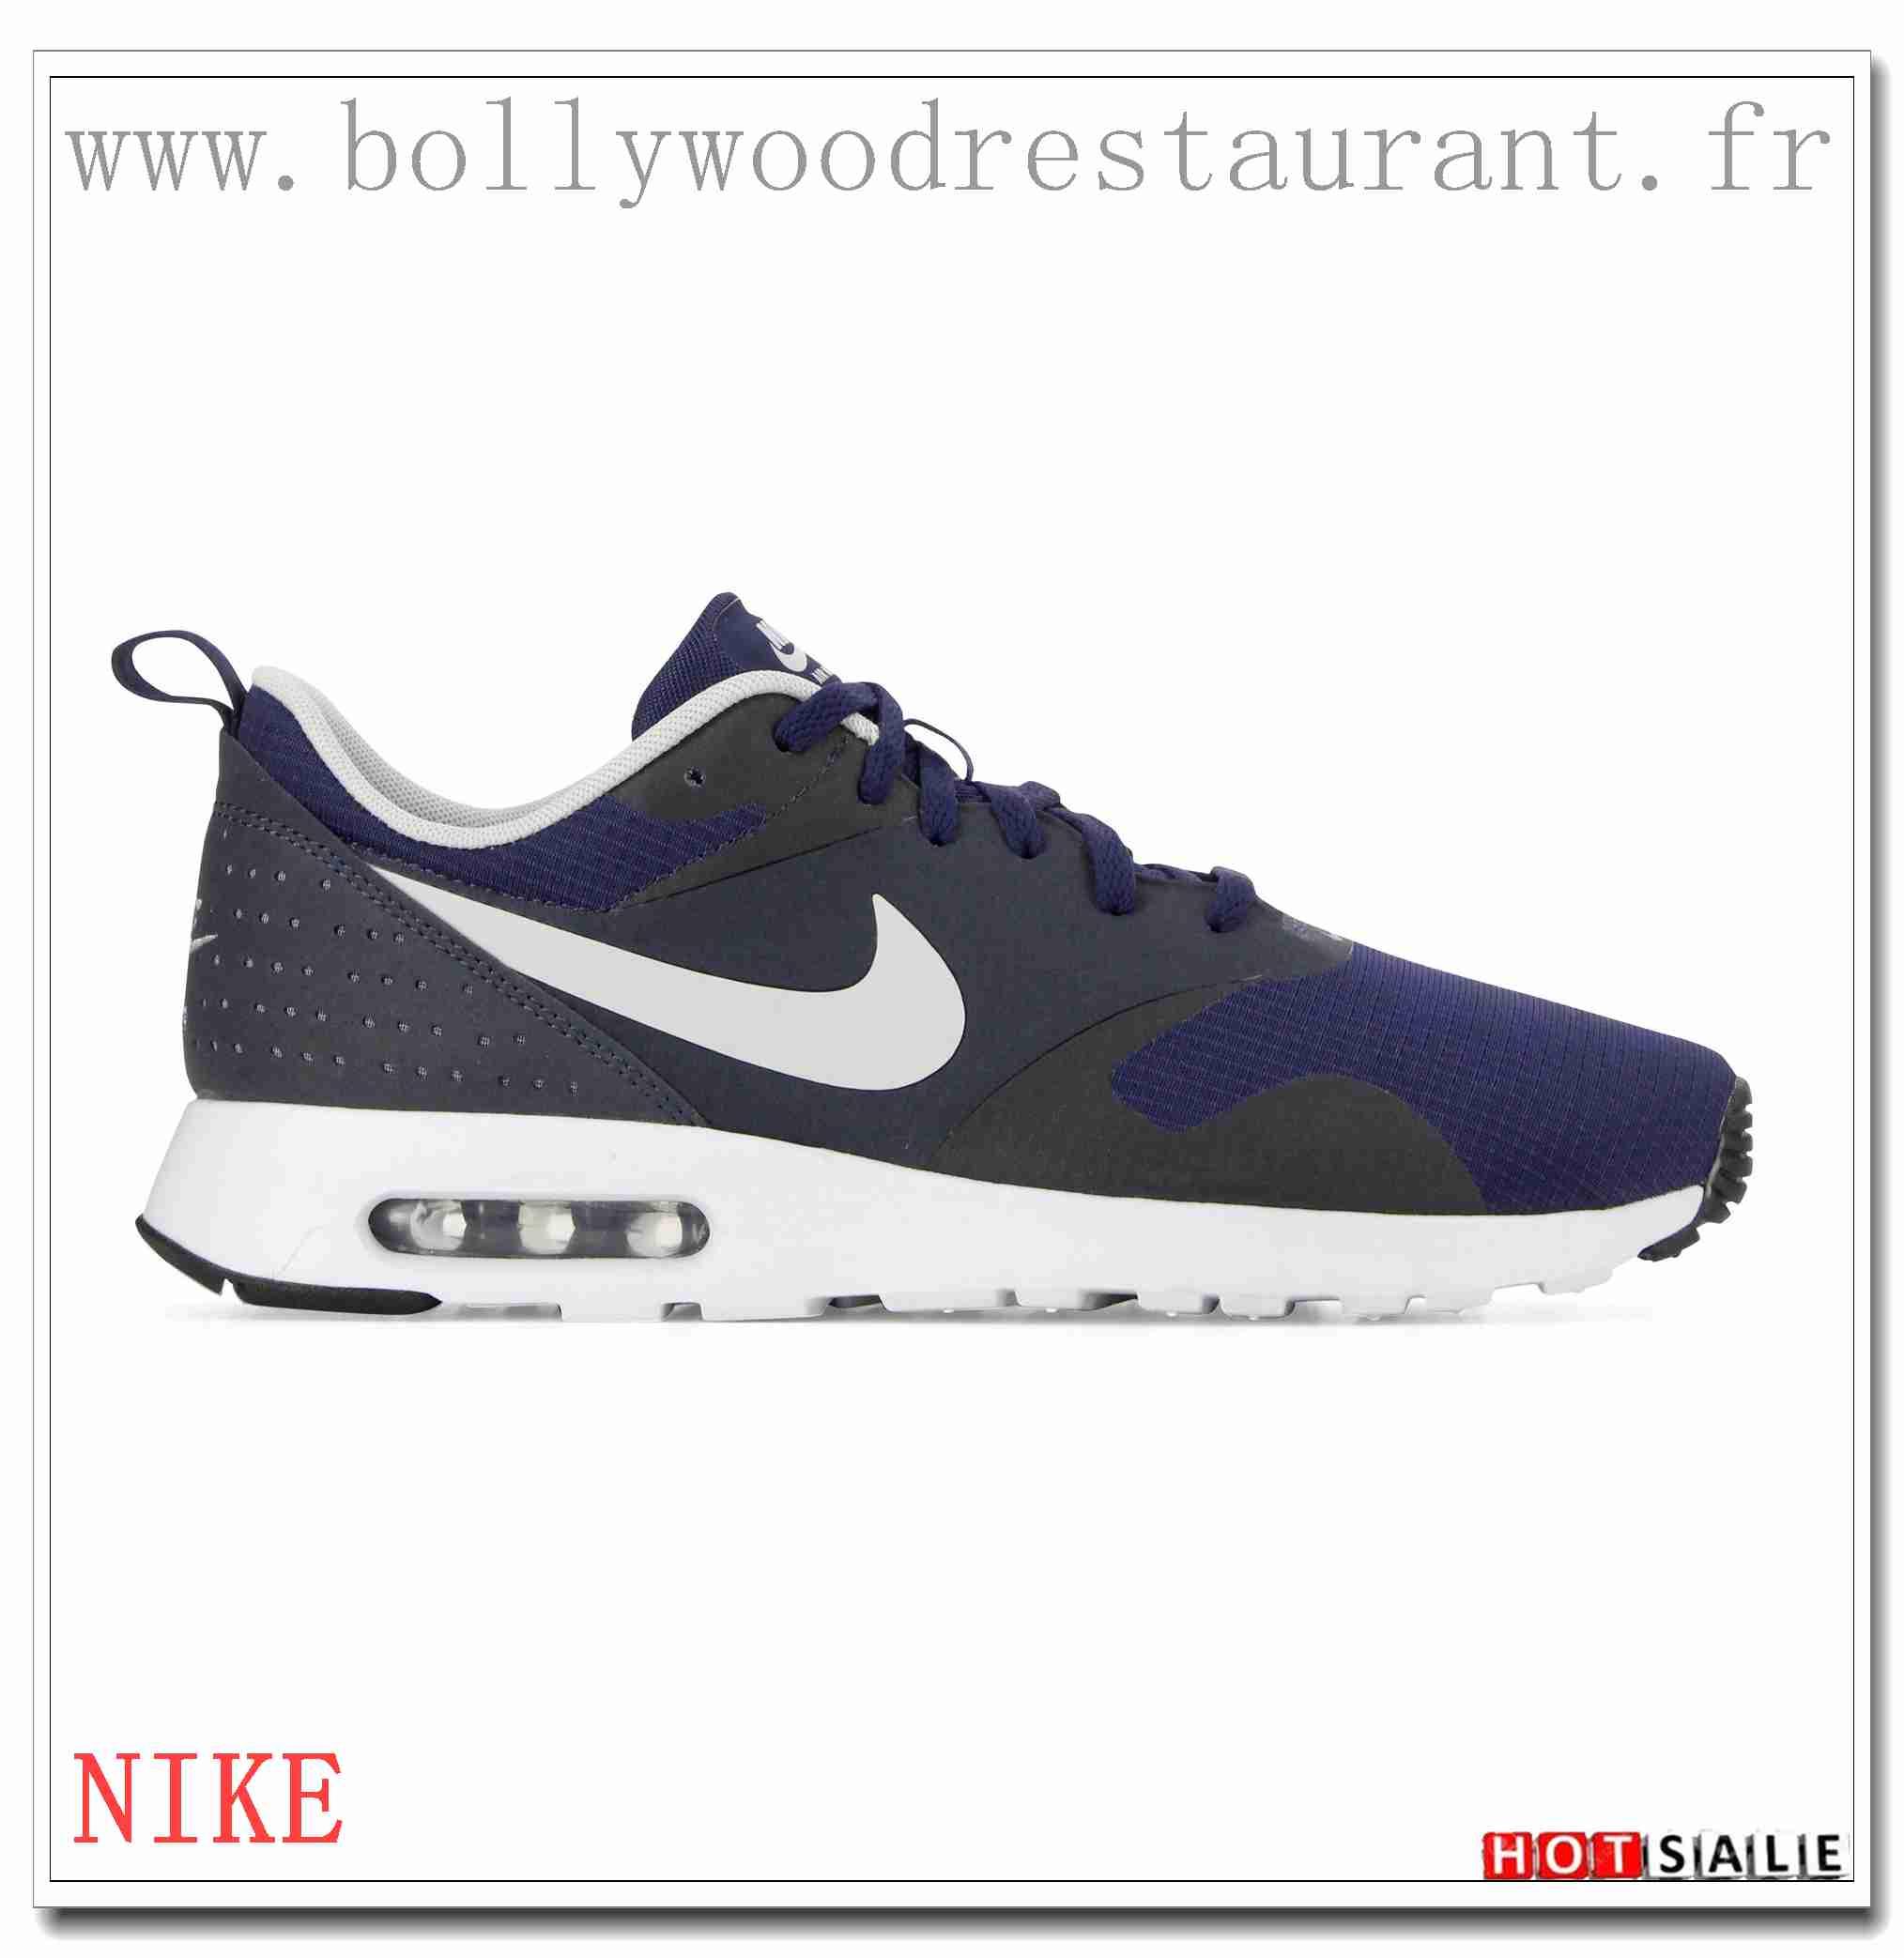 brand new d6e1a 089ce XV8559 En Ligne 2018 Nouveau style Nike Air Max Tavas - Homme Chaussures -  Promotions Vente - H.K.Y. 771 - Taille   40~44